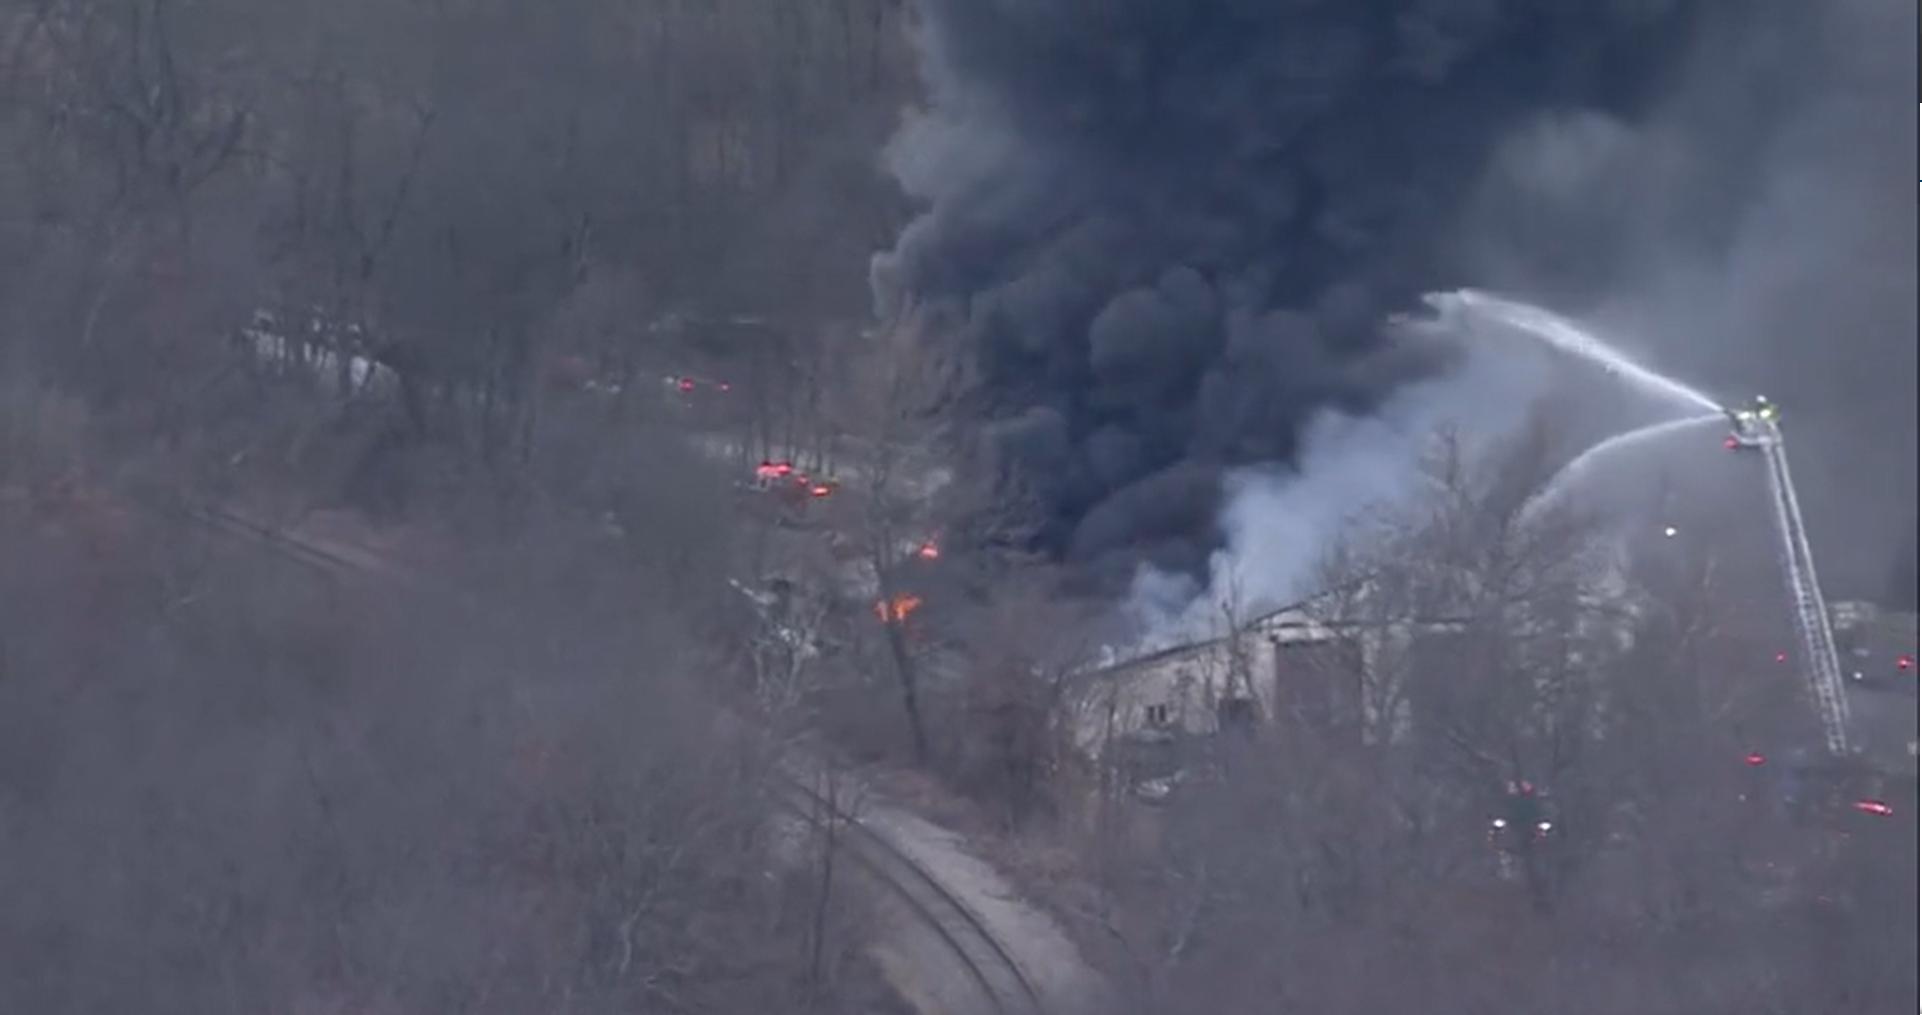 Propane Explosion in Pennsylvania Injures Three